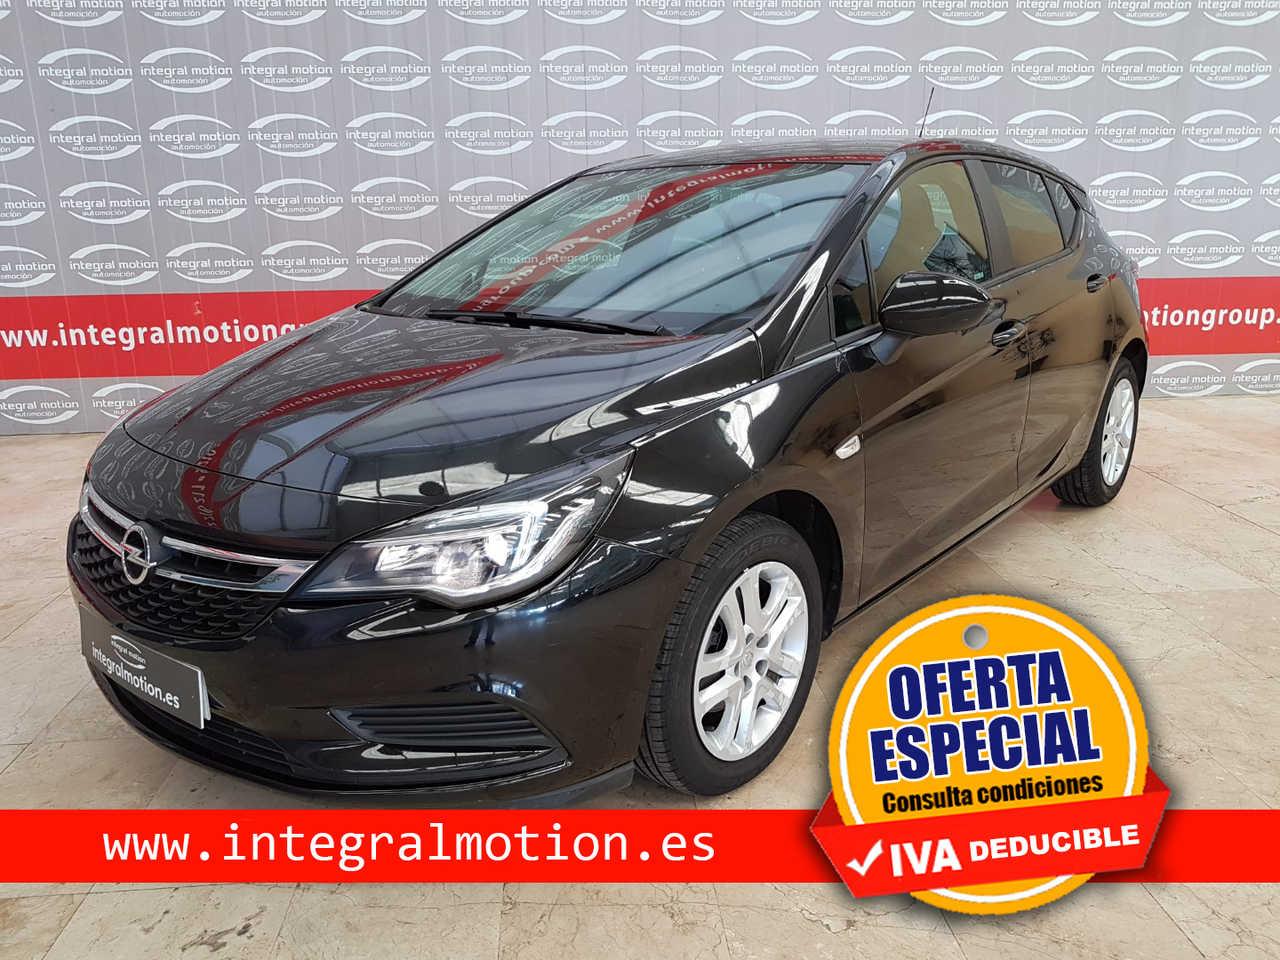 Opel Astra Selective 1.4 125CV   - Foto 1